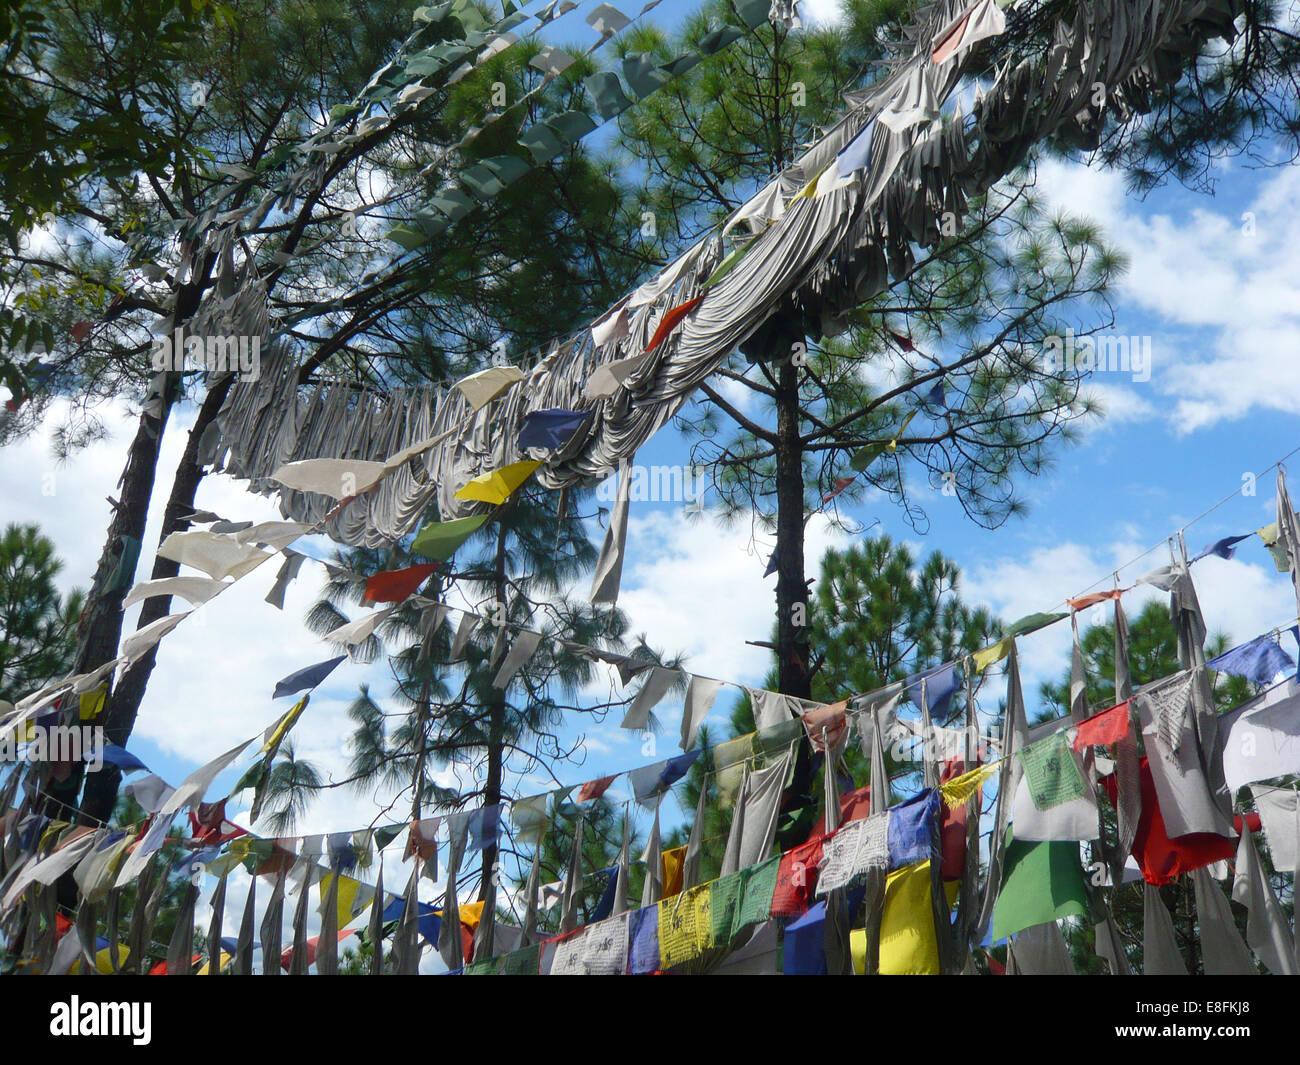 Tibetan Prayer Flags hanging in trees, Himachal Pradesh, India - Stock Image